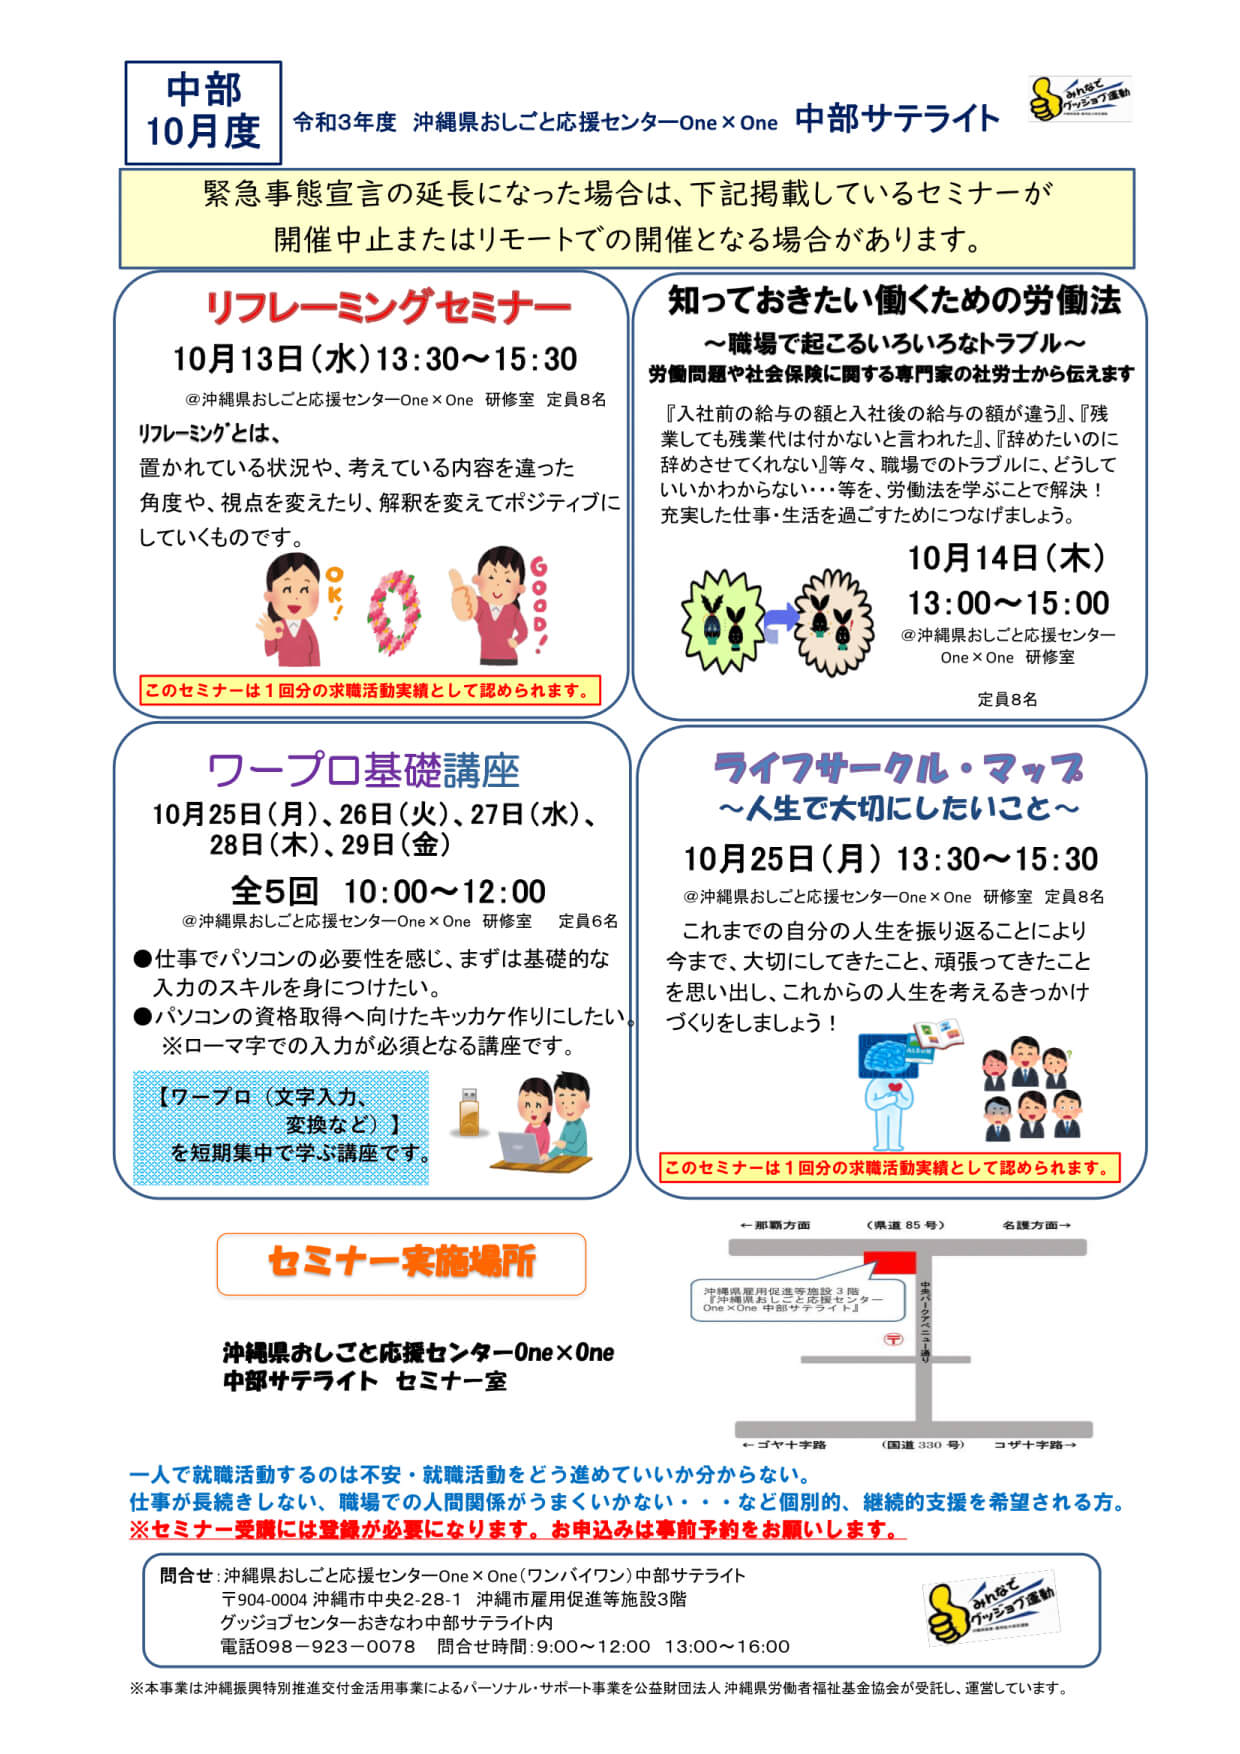 One×One中部で10月開催予定のセミナーです。